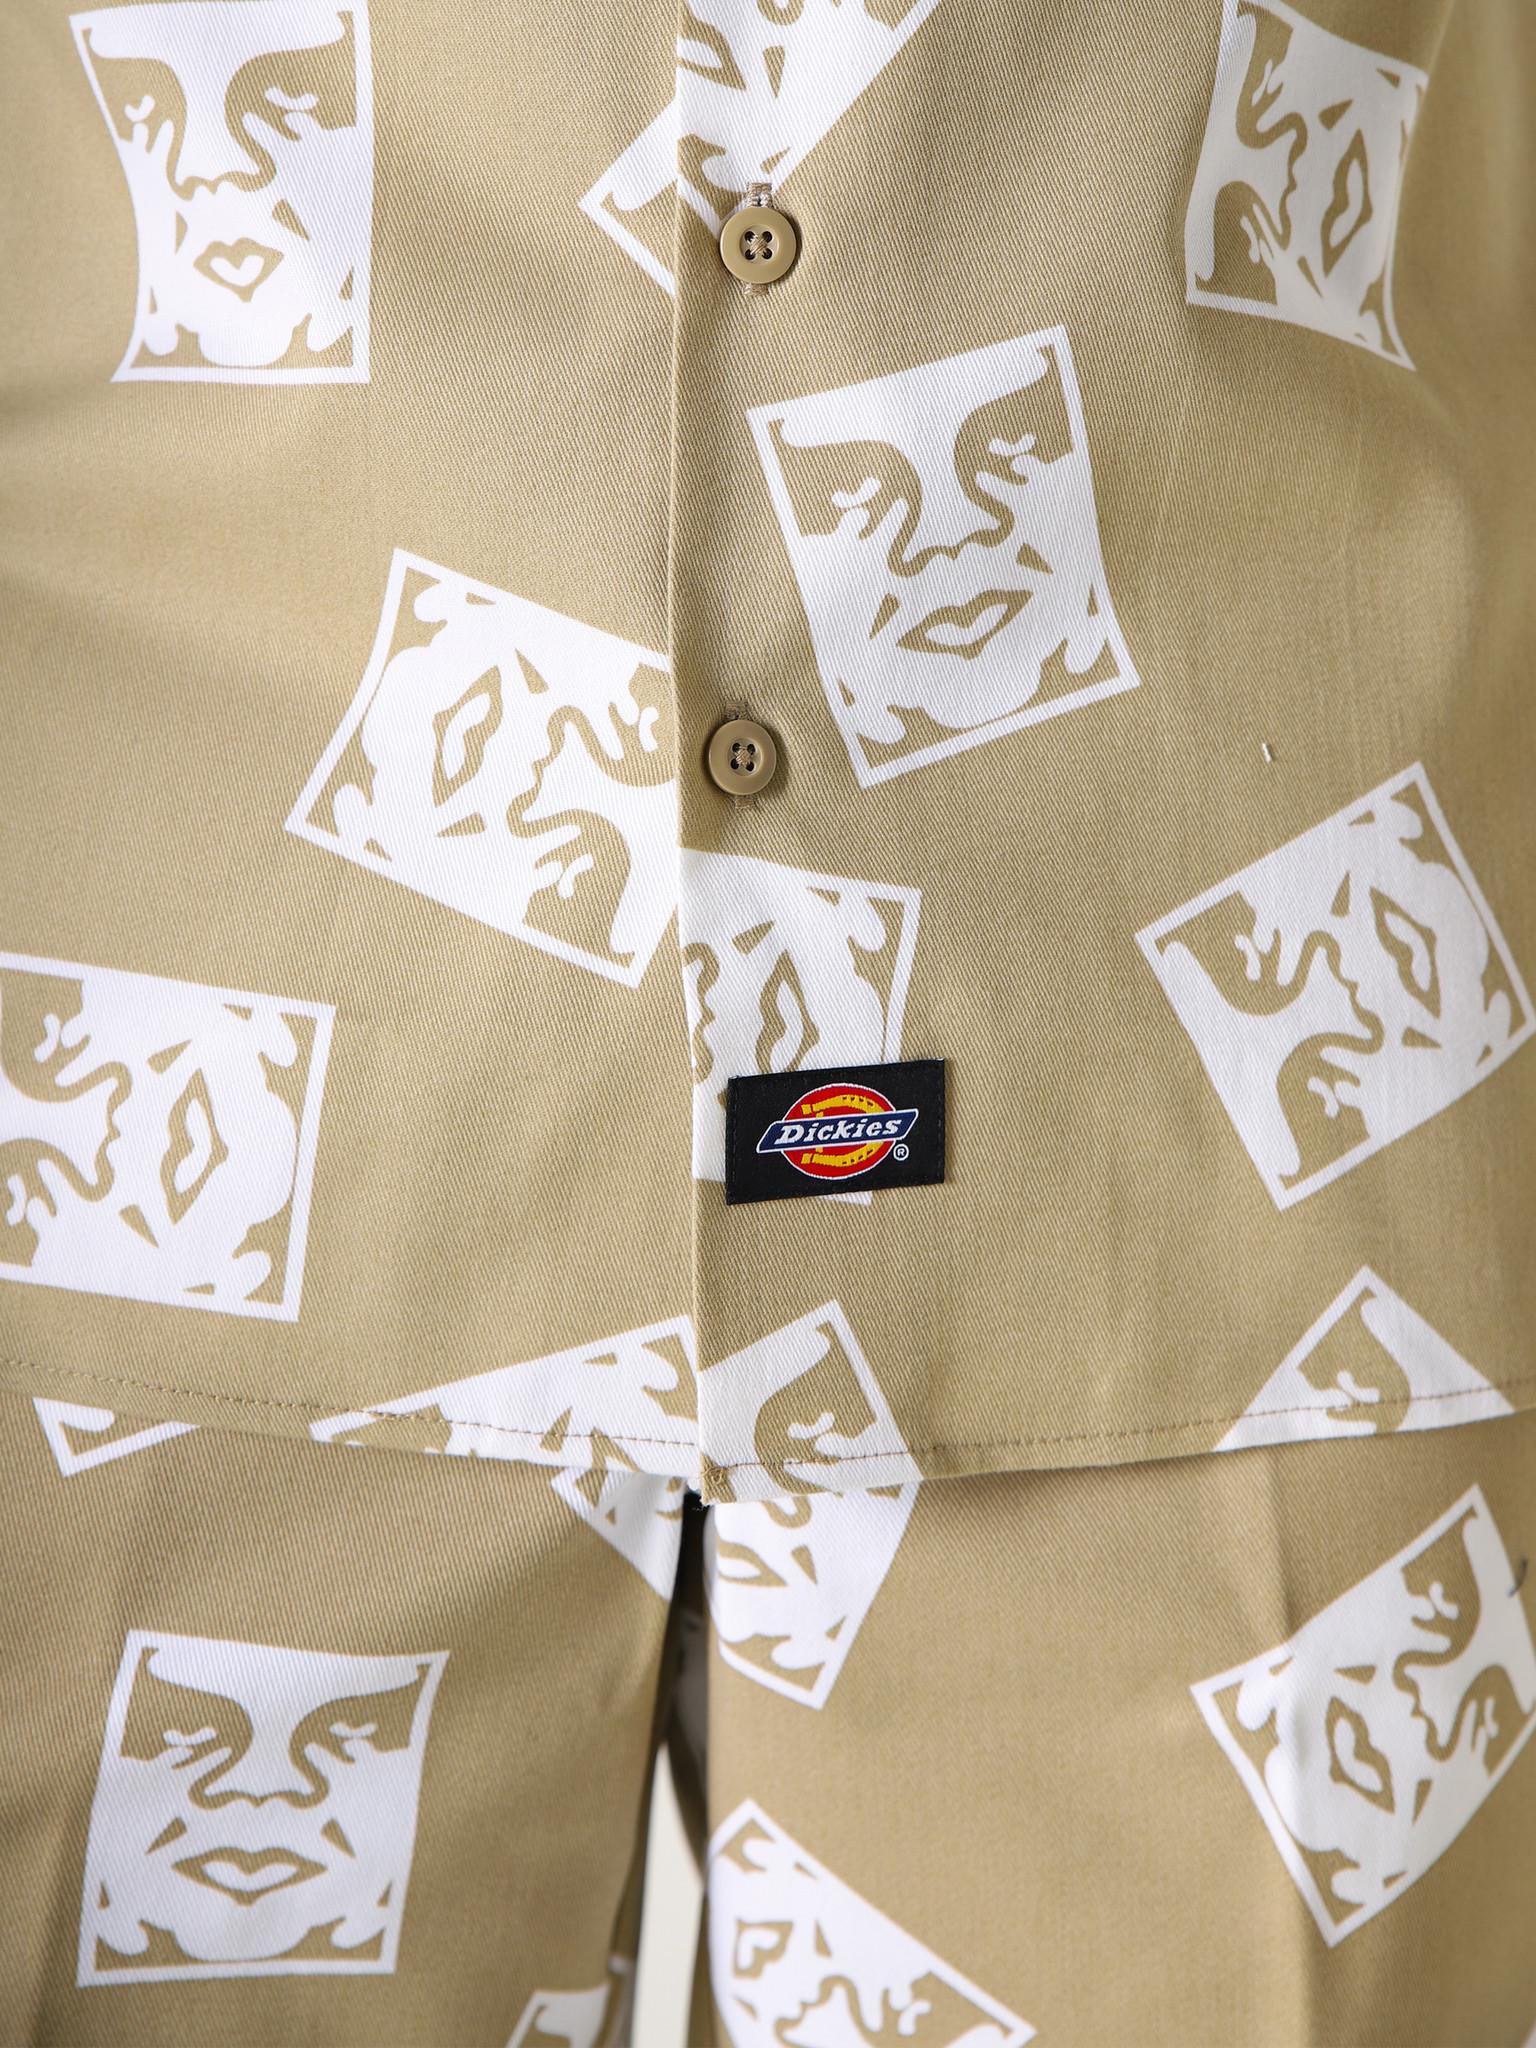 Obey Obey x Dickies WS576 Work Shirt Khaki 181210300KHA